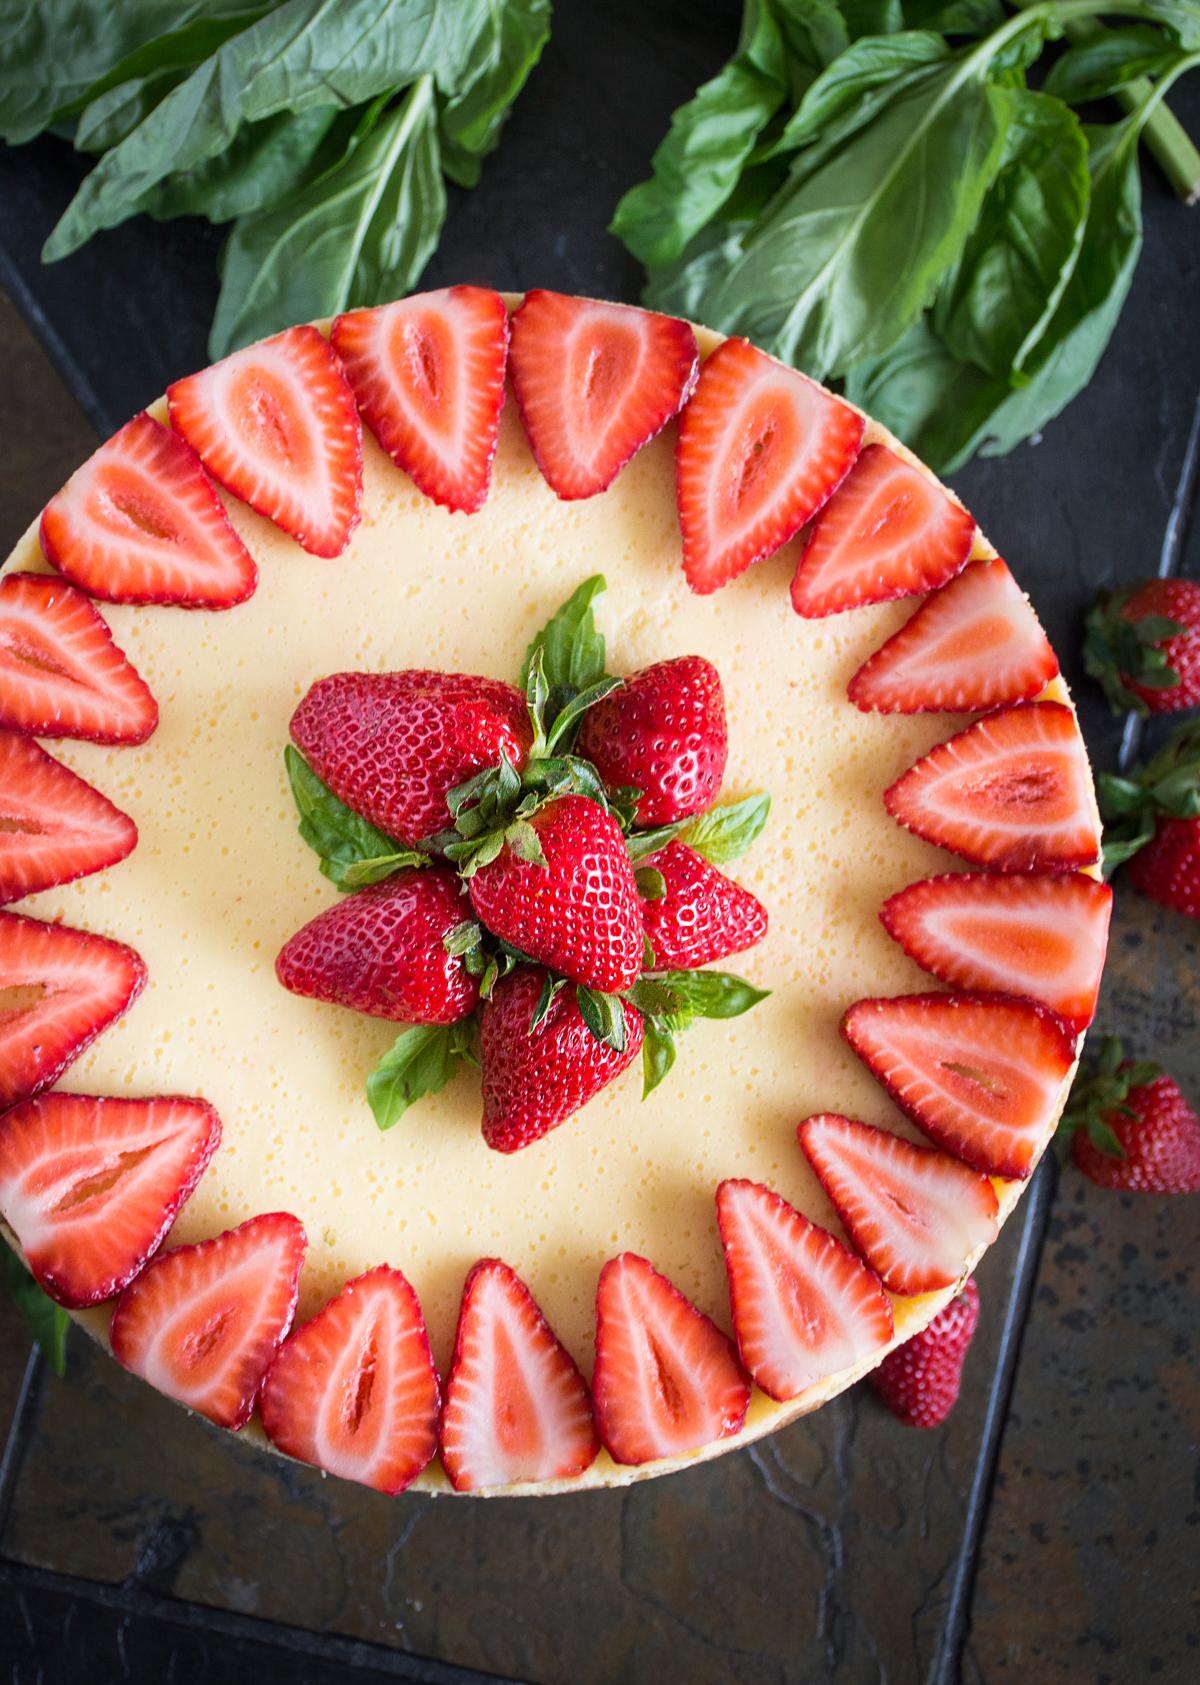 Strawberry Cake Recipe - NatashasKitchen.com |Strawberry Cake Decoration